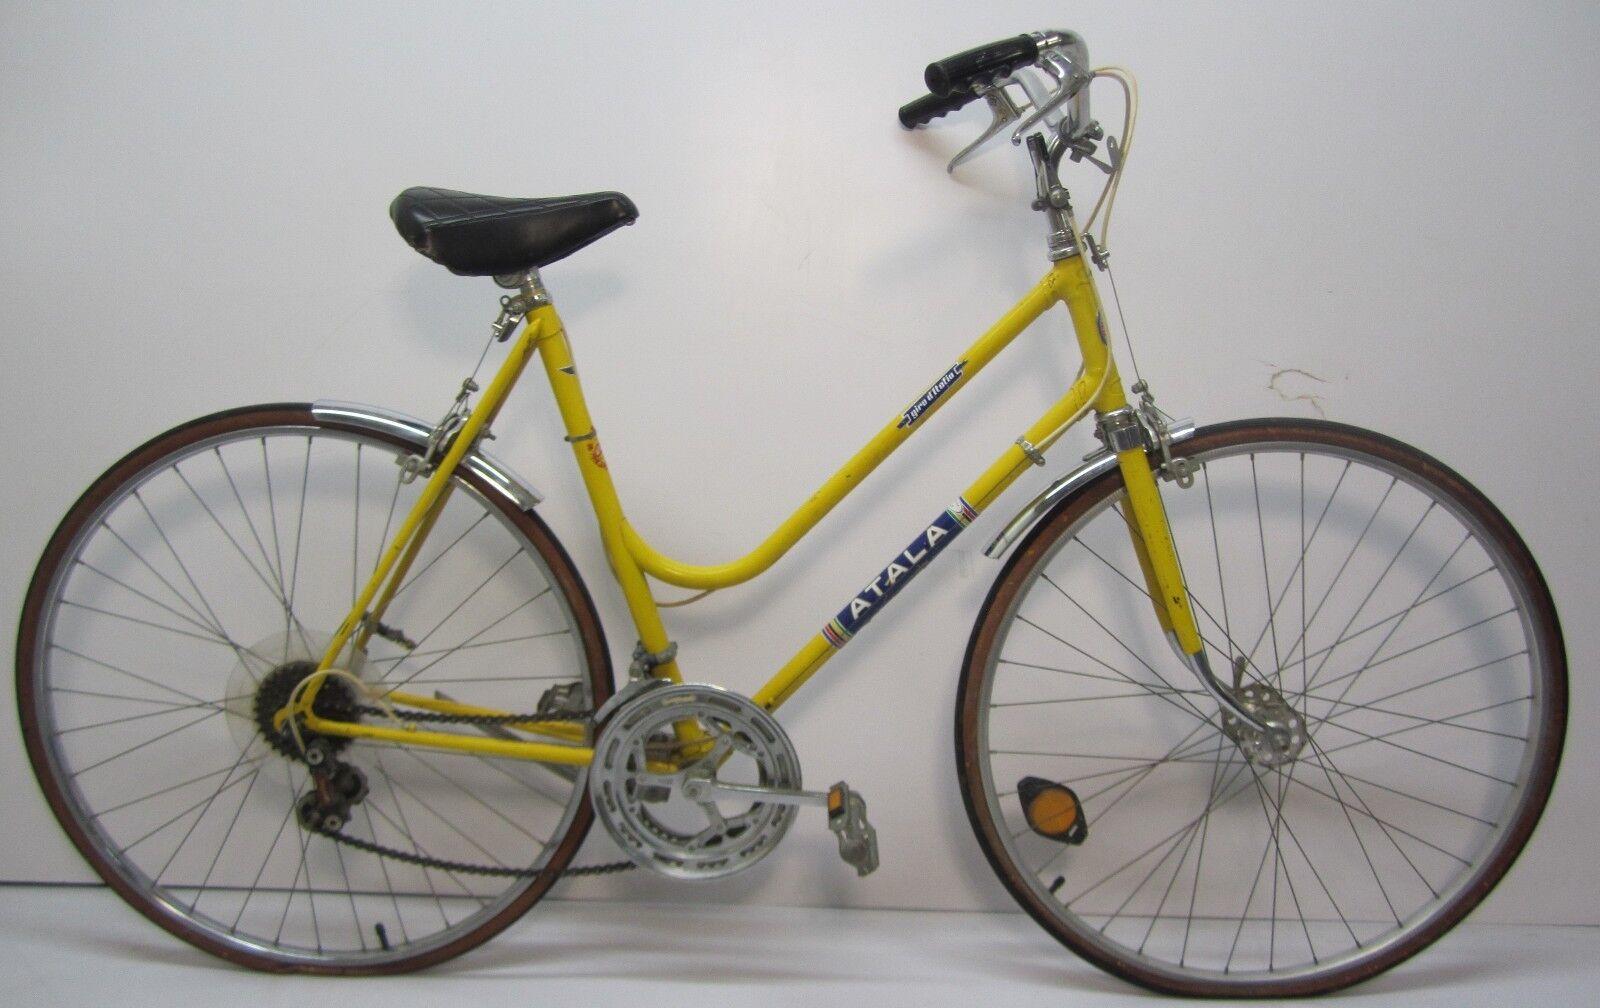 Vintage Atala  Giro D'Italia Bike Bicycle Womens Parts Restoration Project